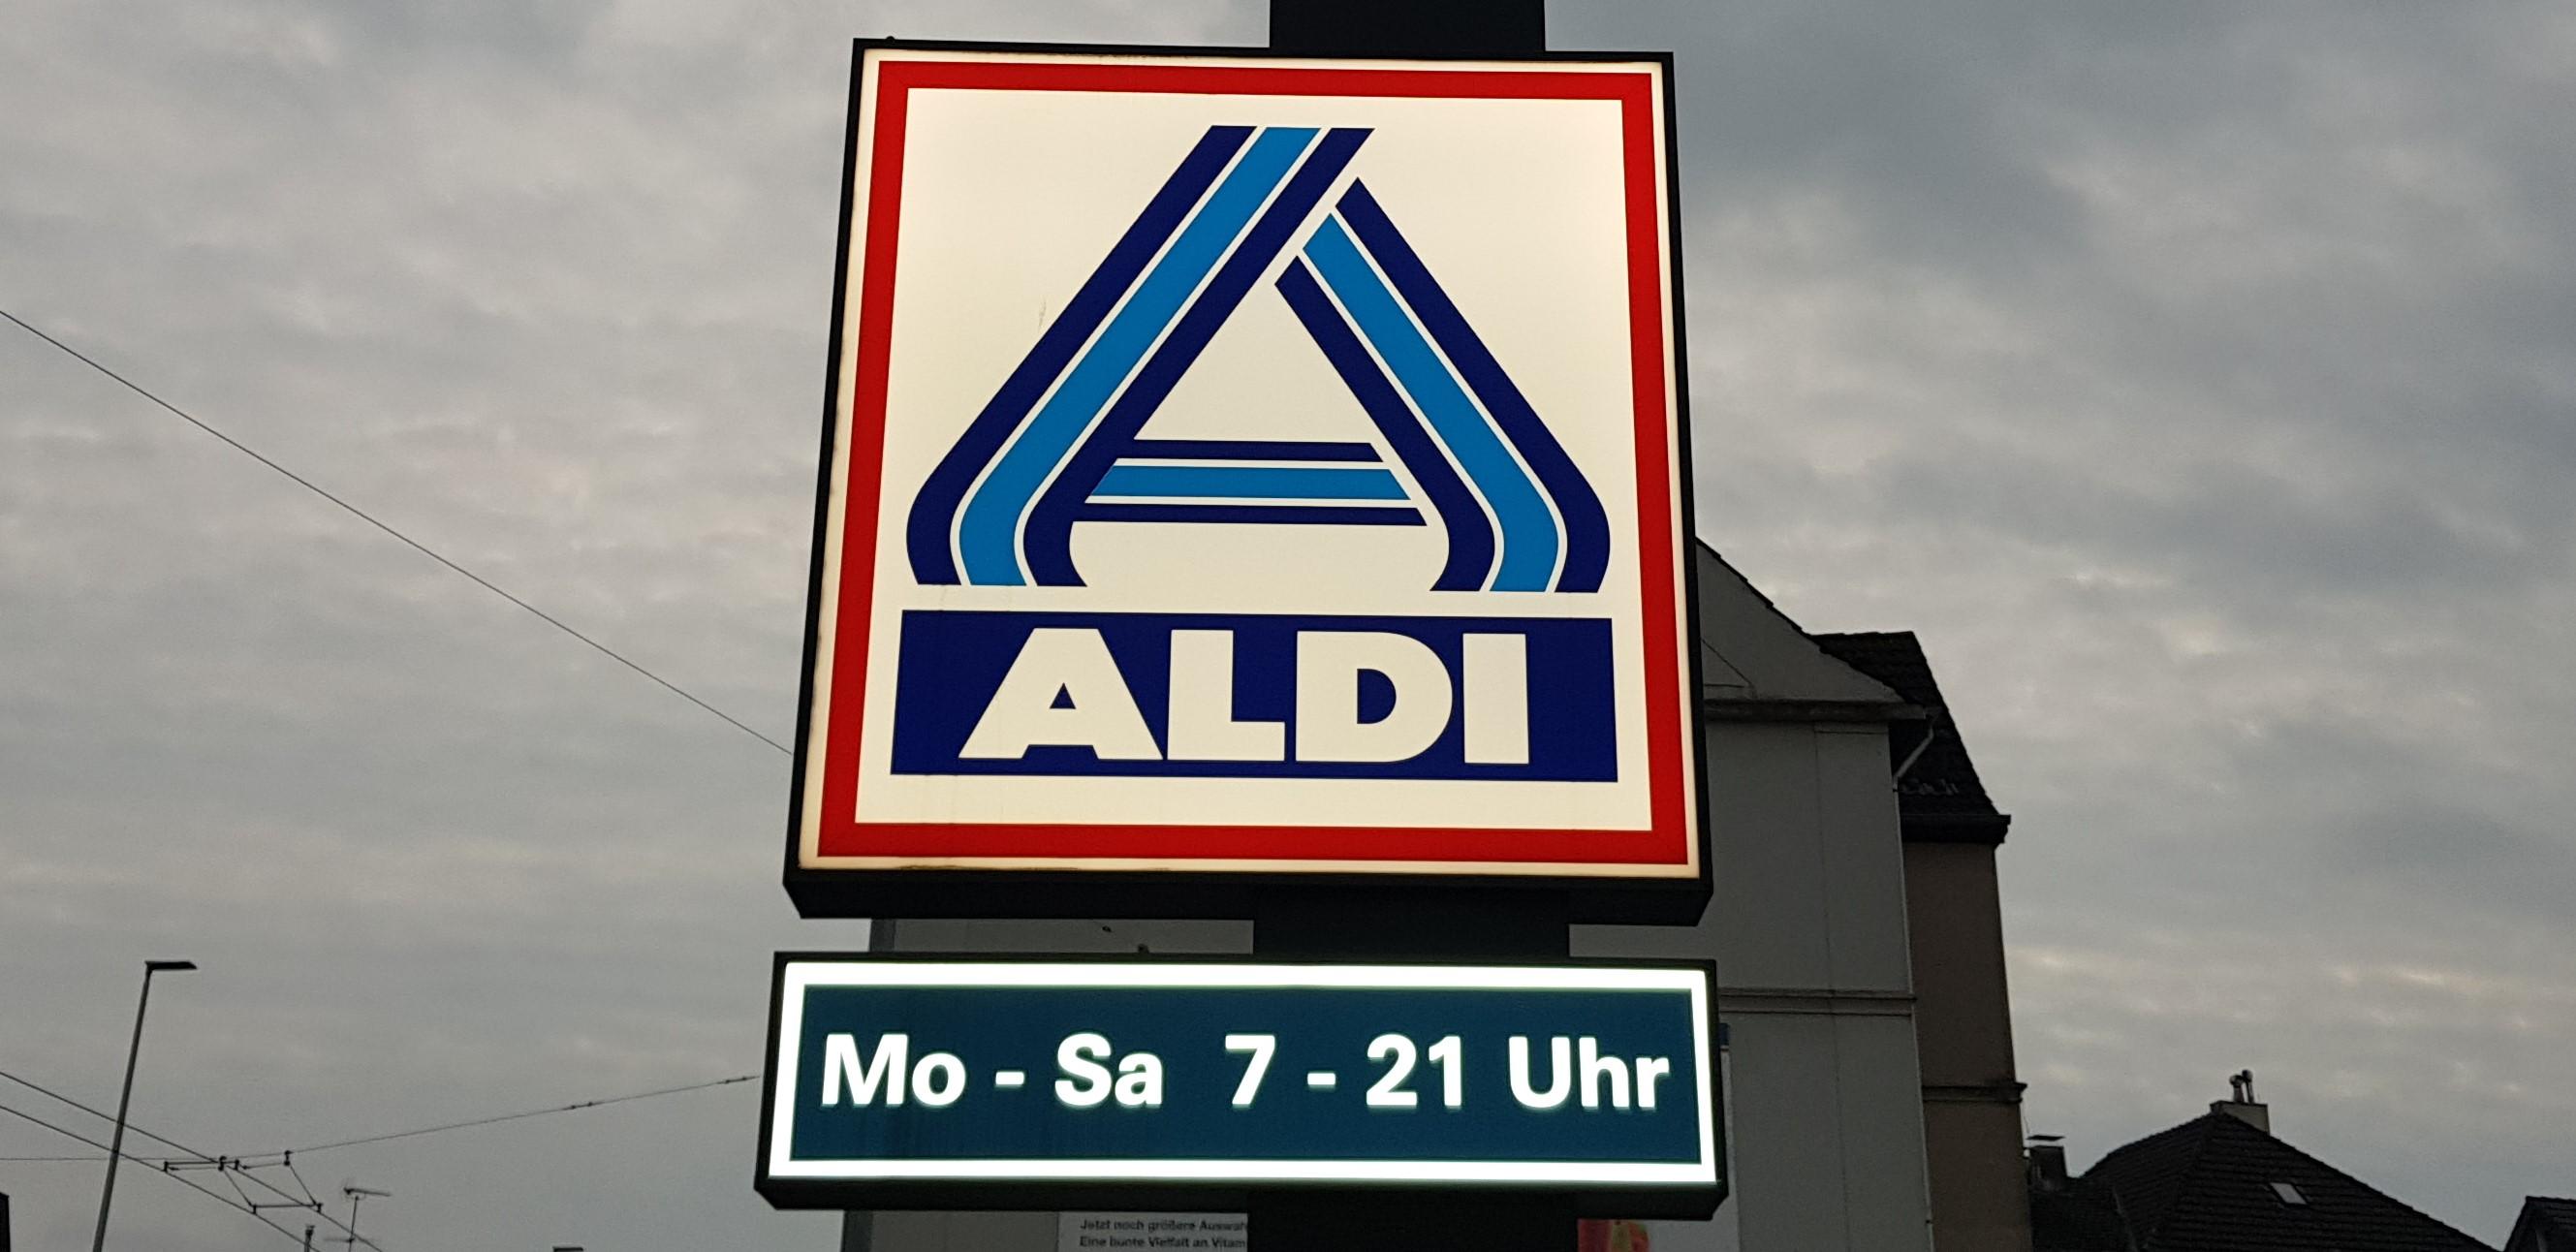 Aldi-NordDwmllO9wJ2EgO